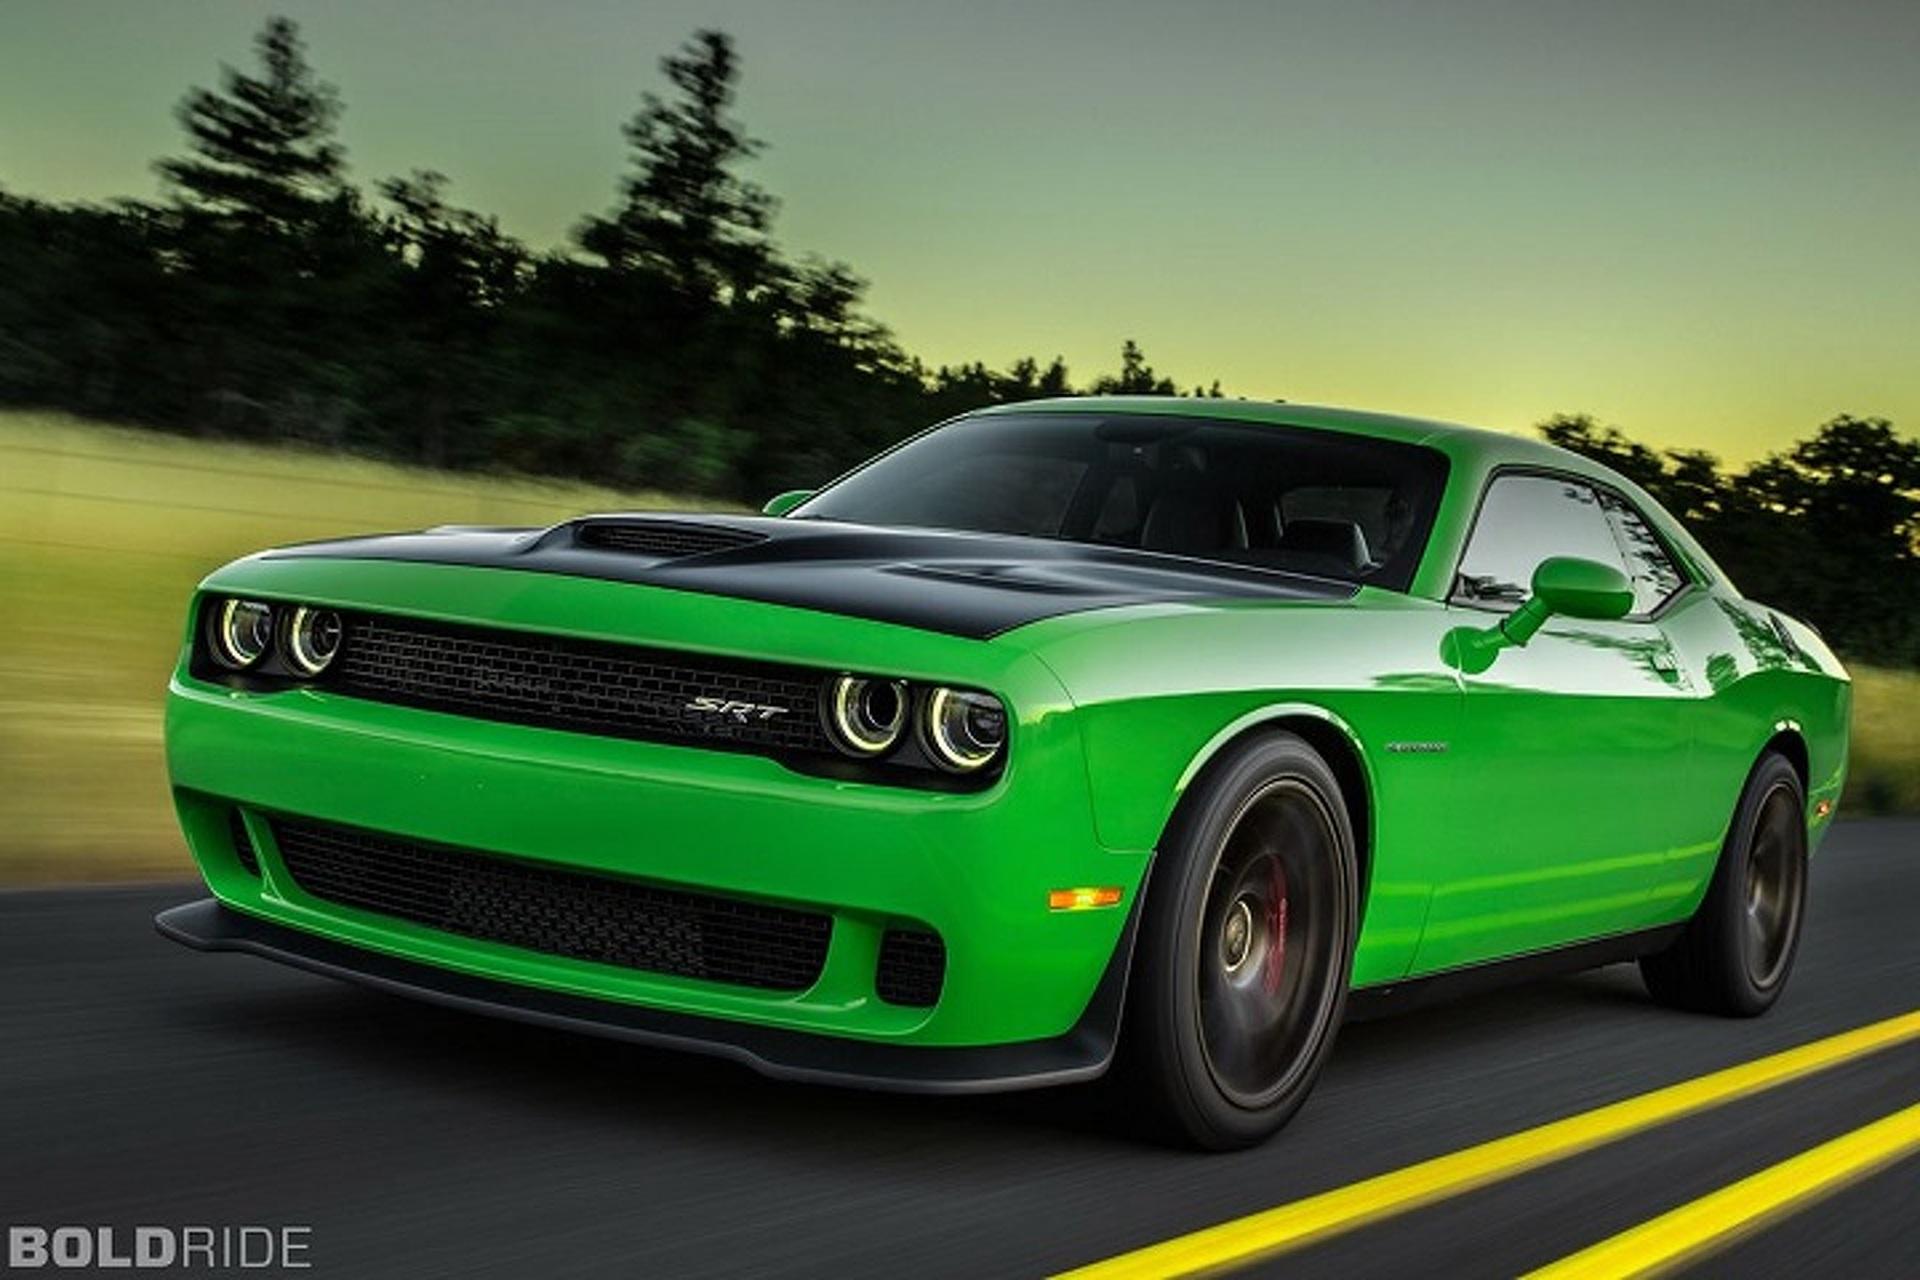 Famous Top American Car Contemporary - Classic Cars Ideas - boiq.info